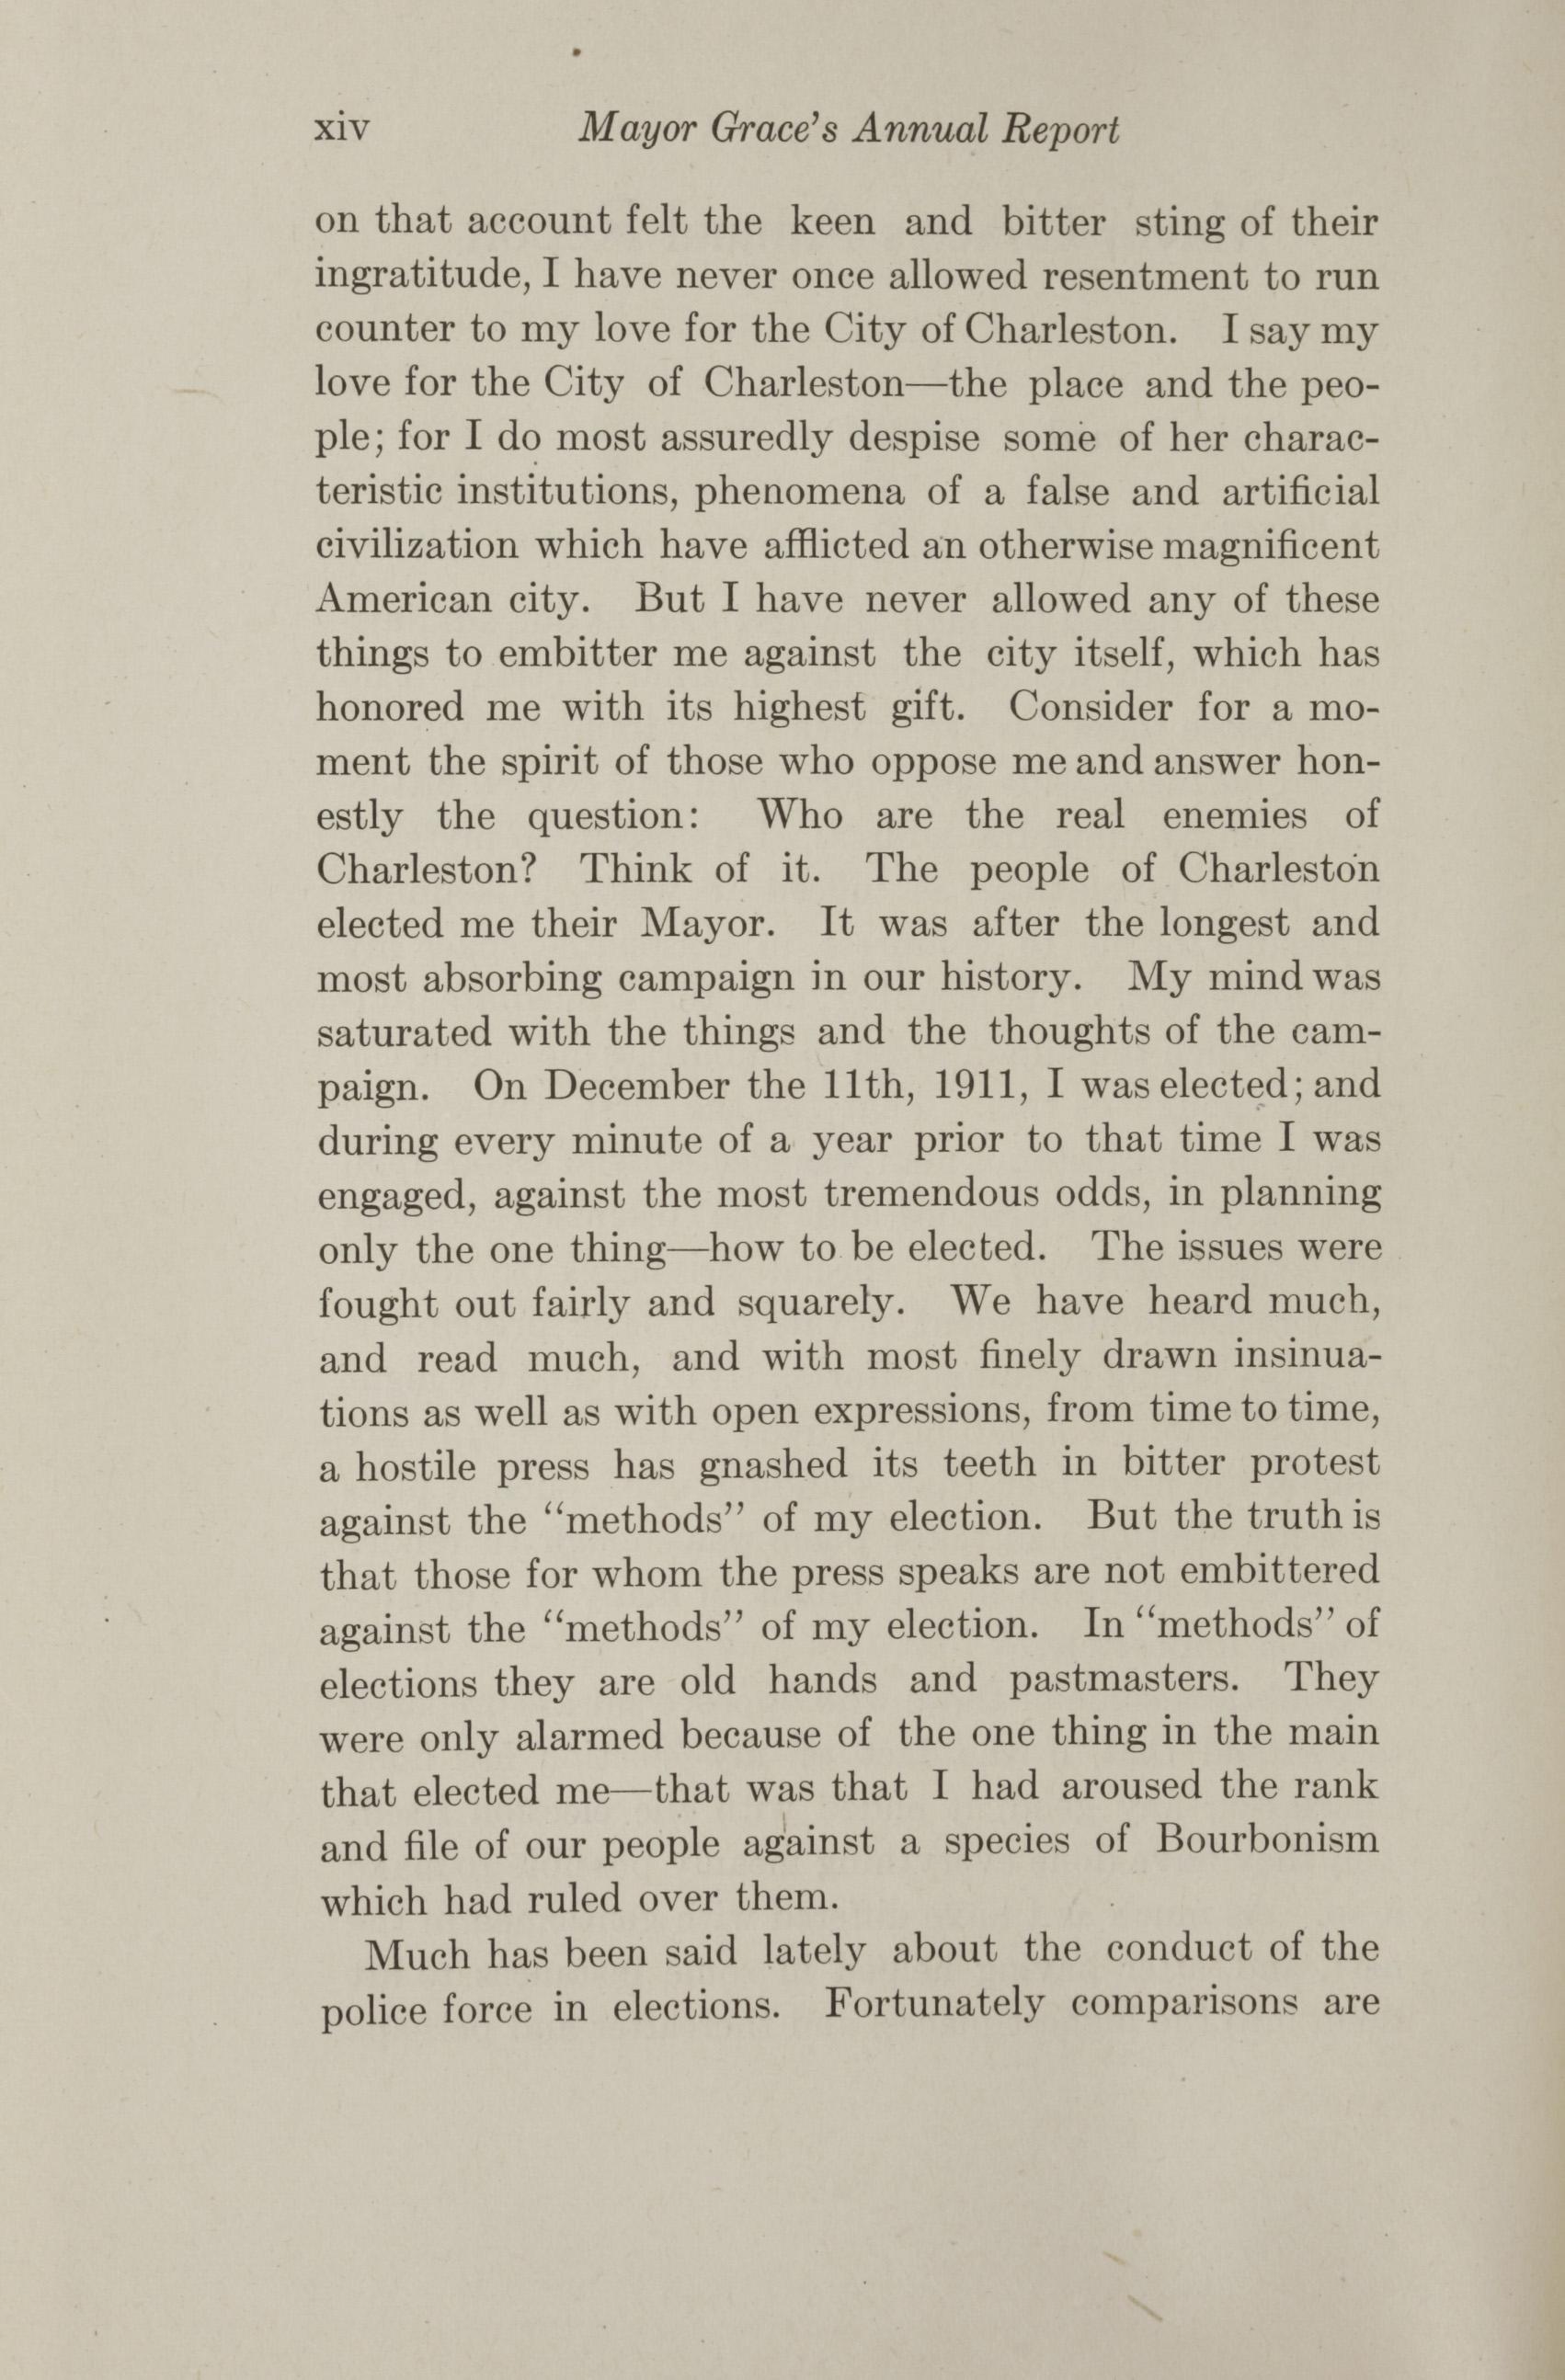 Charleston Yearbook, 1912, page xiv